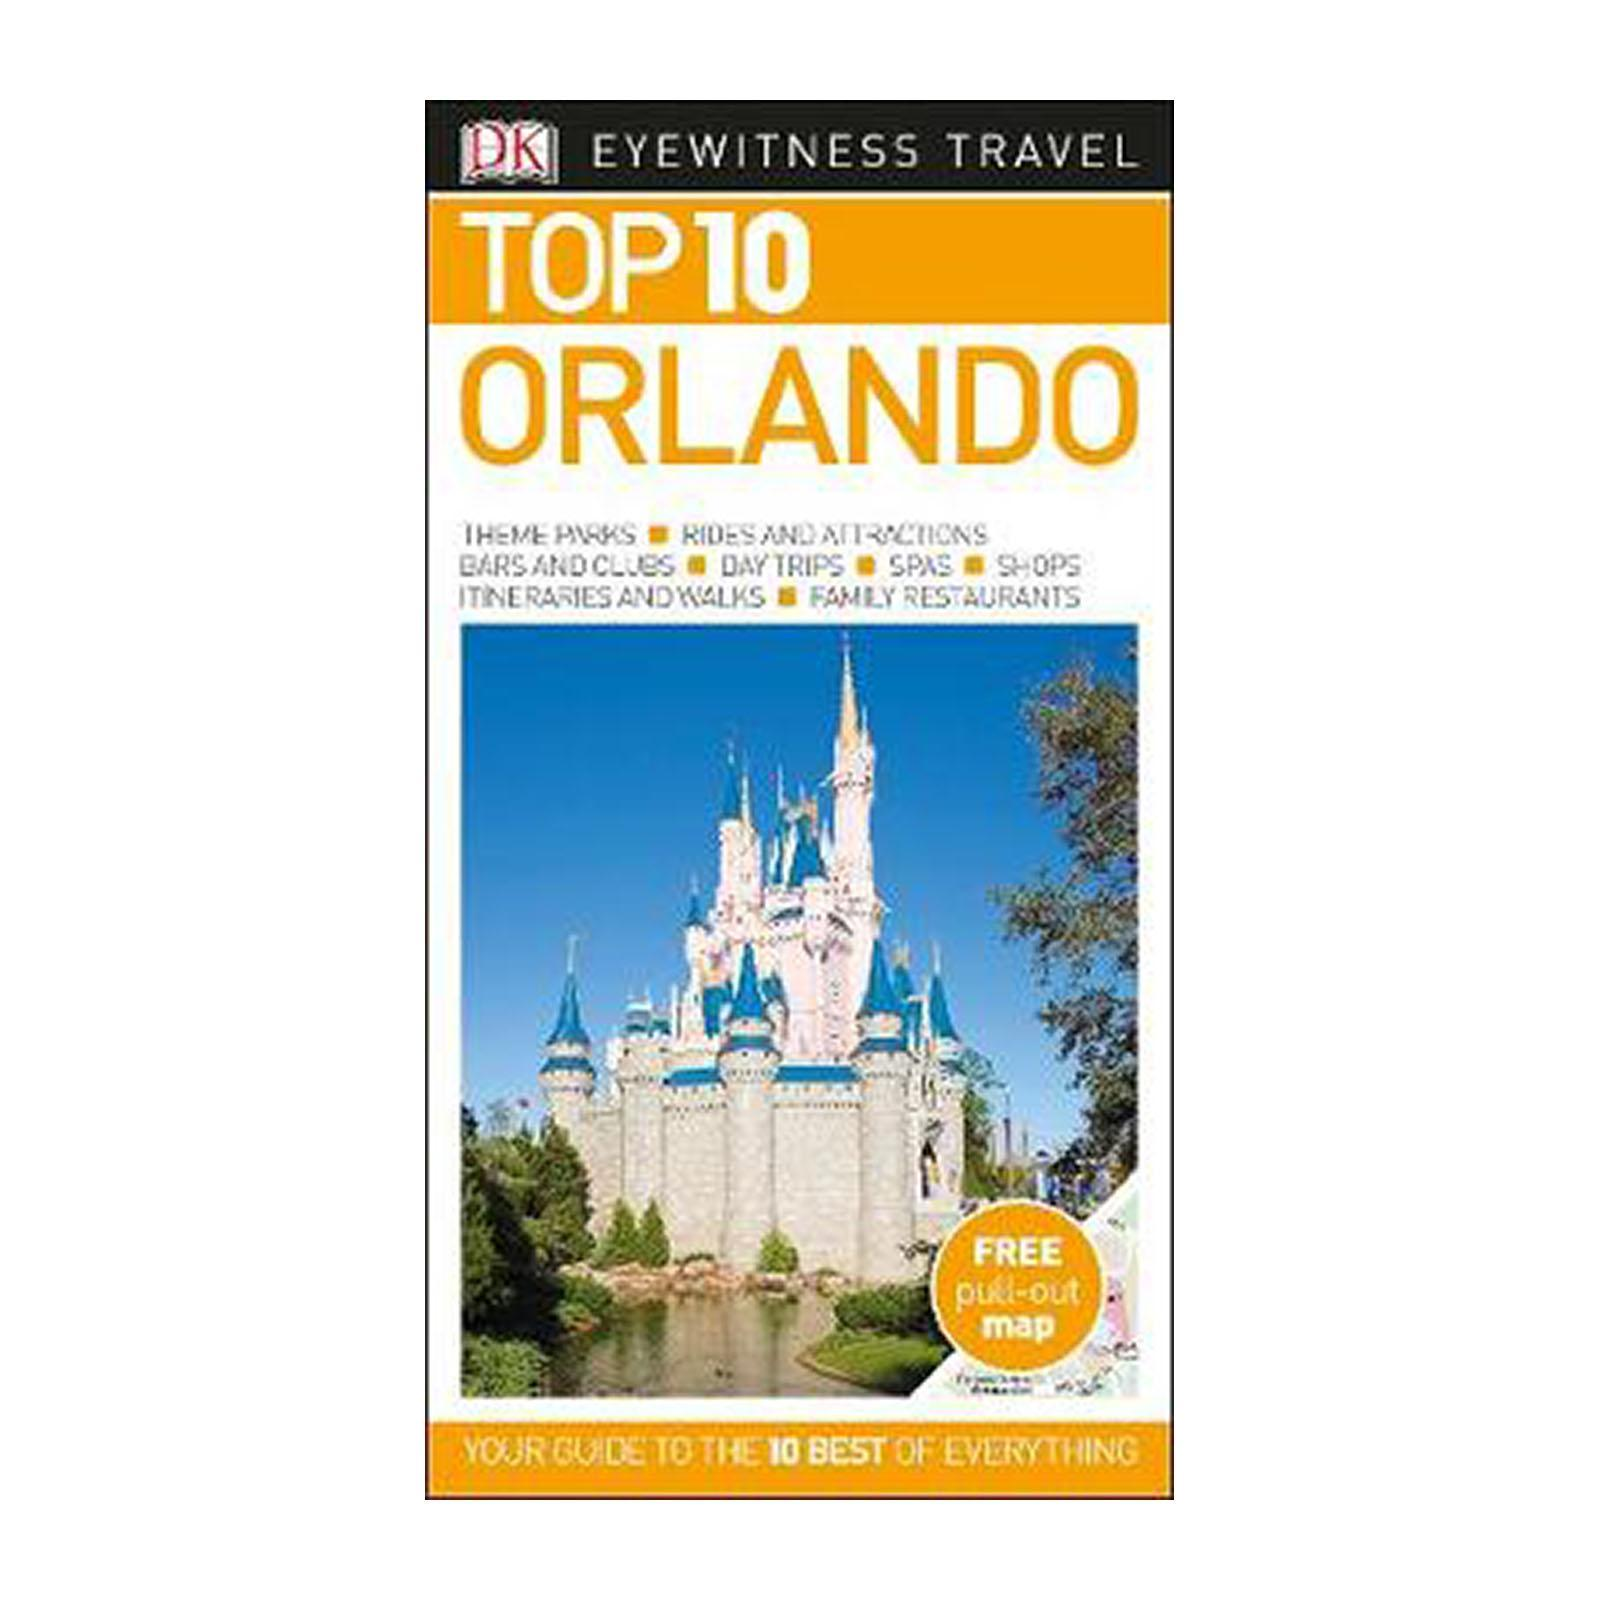 Top 10 Orlando (Paperback)